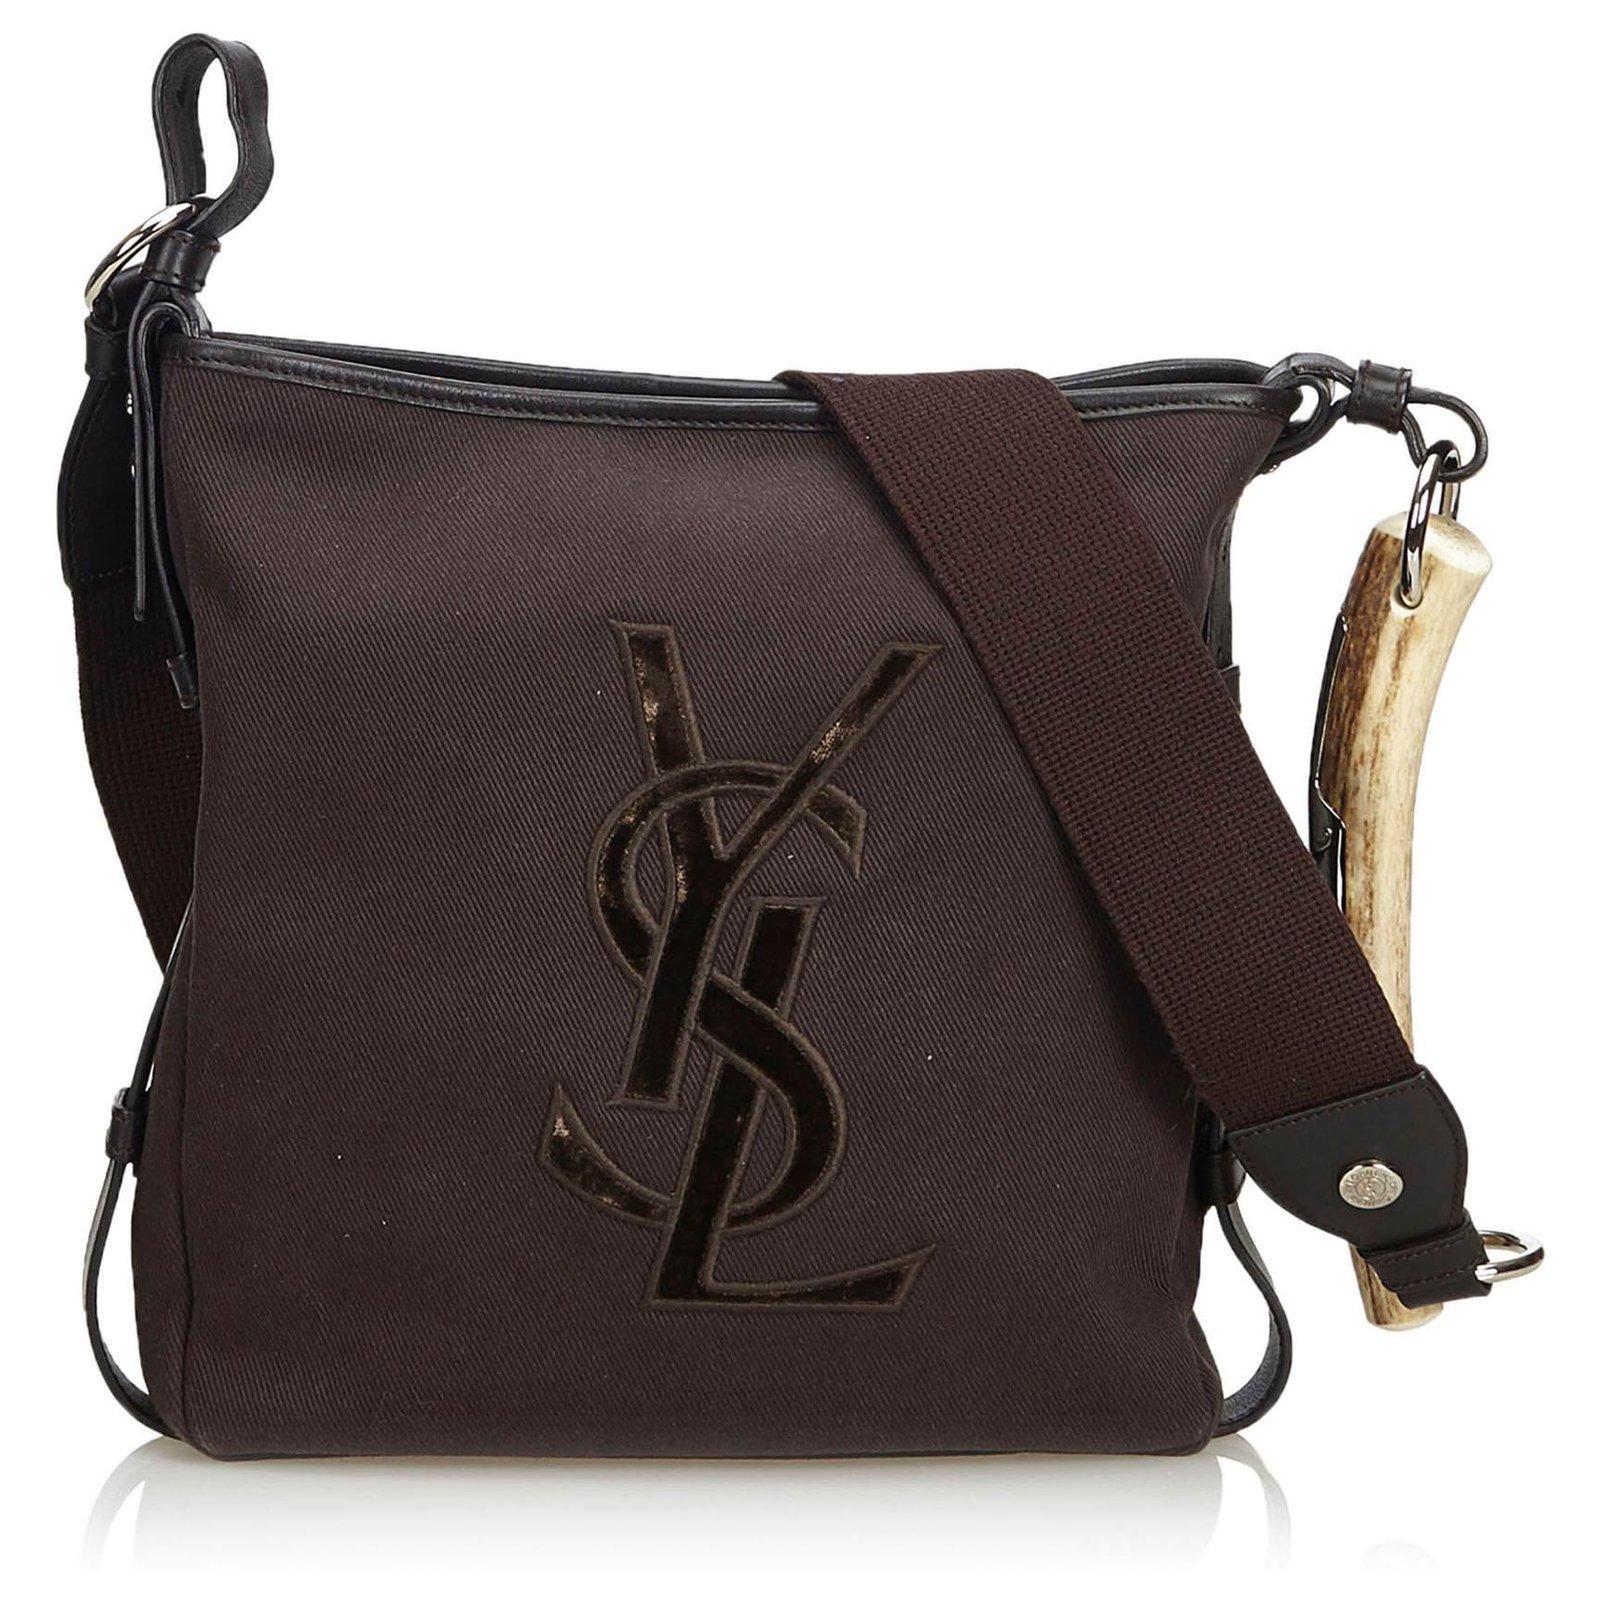 d96ec5953cc Yves Saint Laurent Mombasa Canvas Crossbody Bag Handbags Leather,Other,Cloth ,Cloth Brown